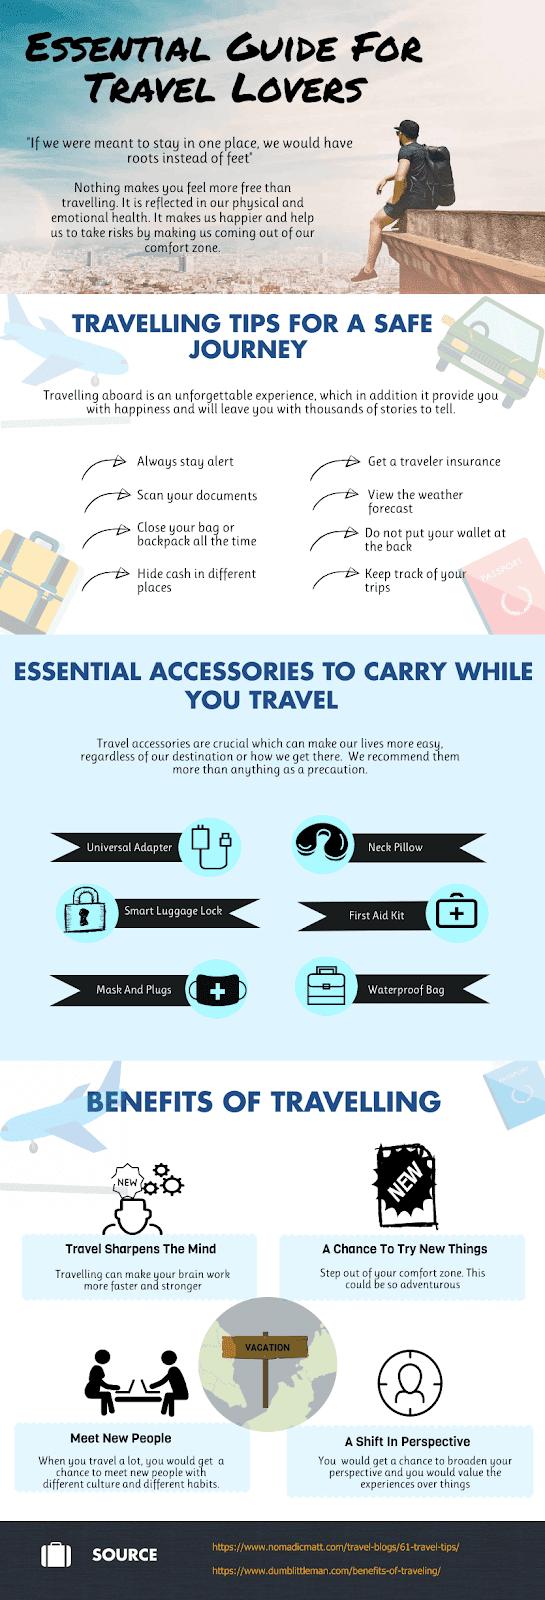 Tanzania-Tez-Travel Original Info